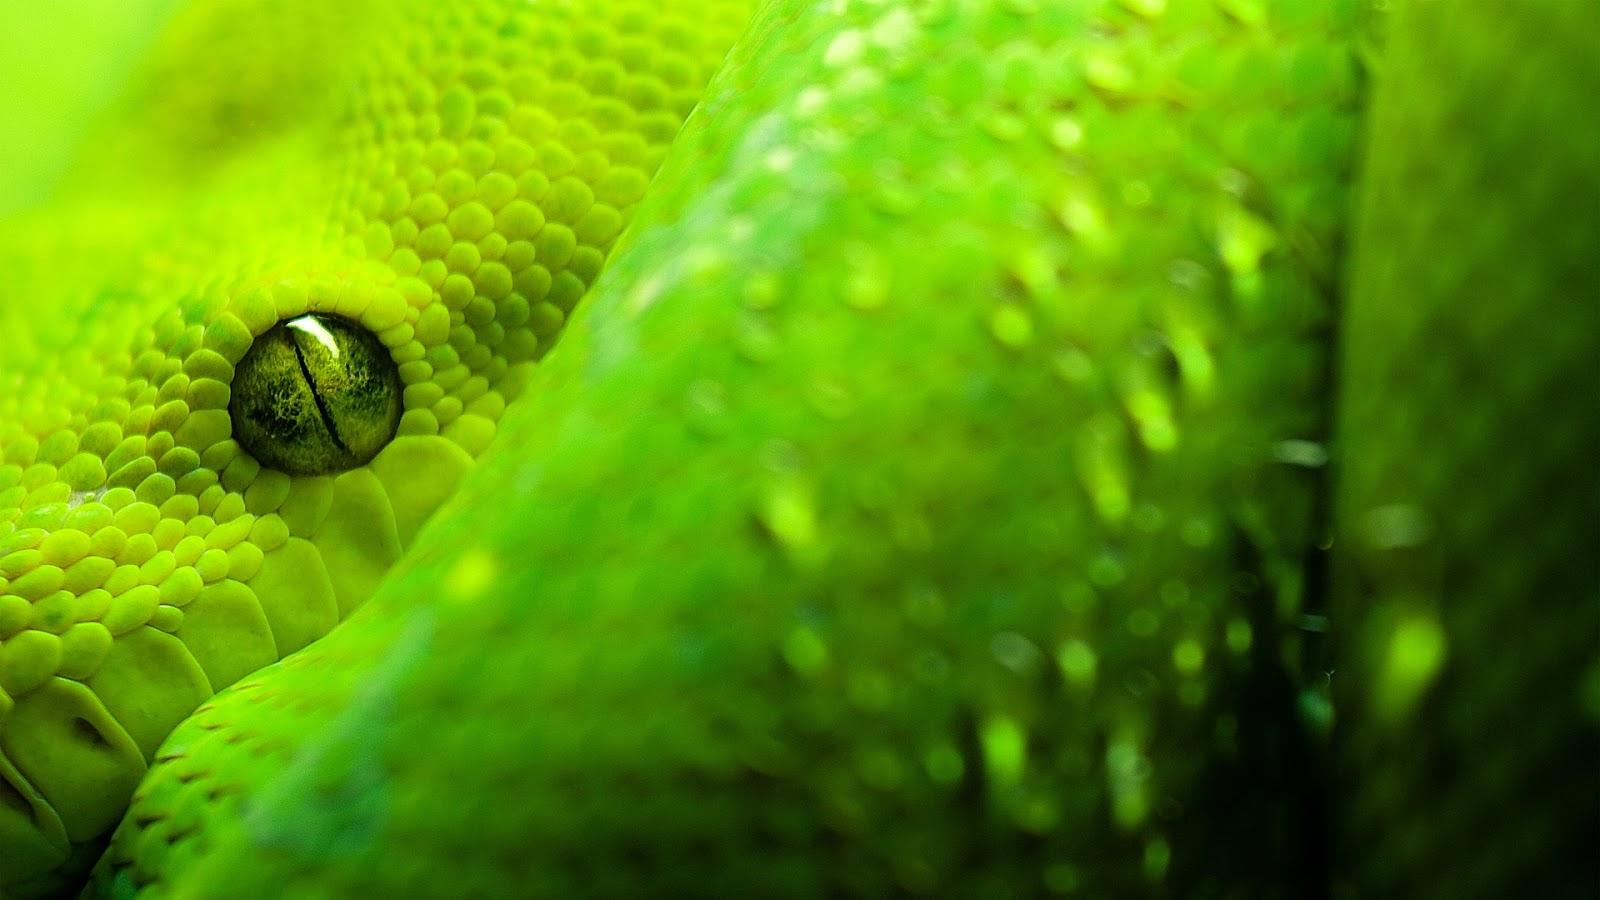 Snakes hd wallpapers wallpaper202 - Green snake hd wallpaper ...